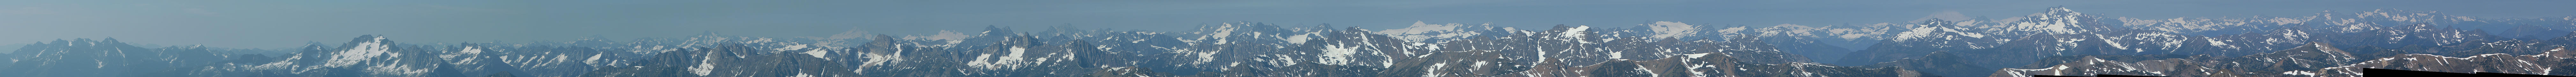 North Cascades pano 1